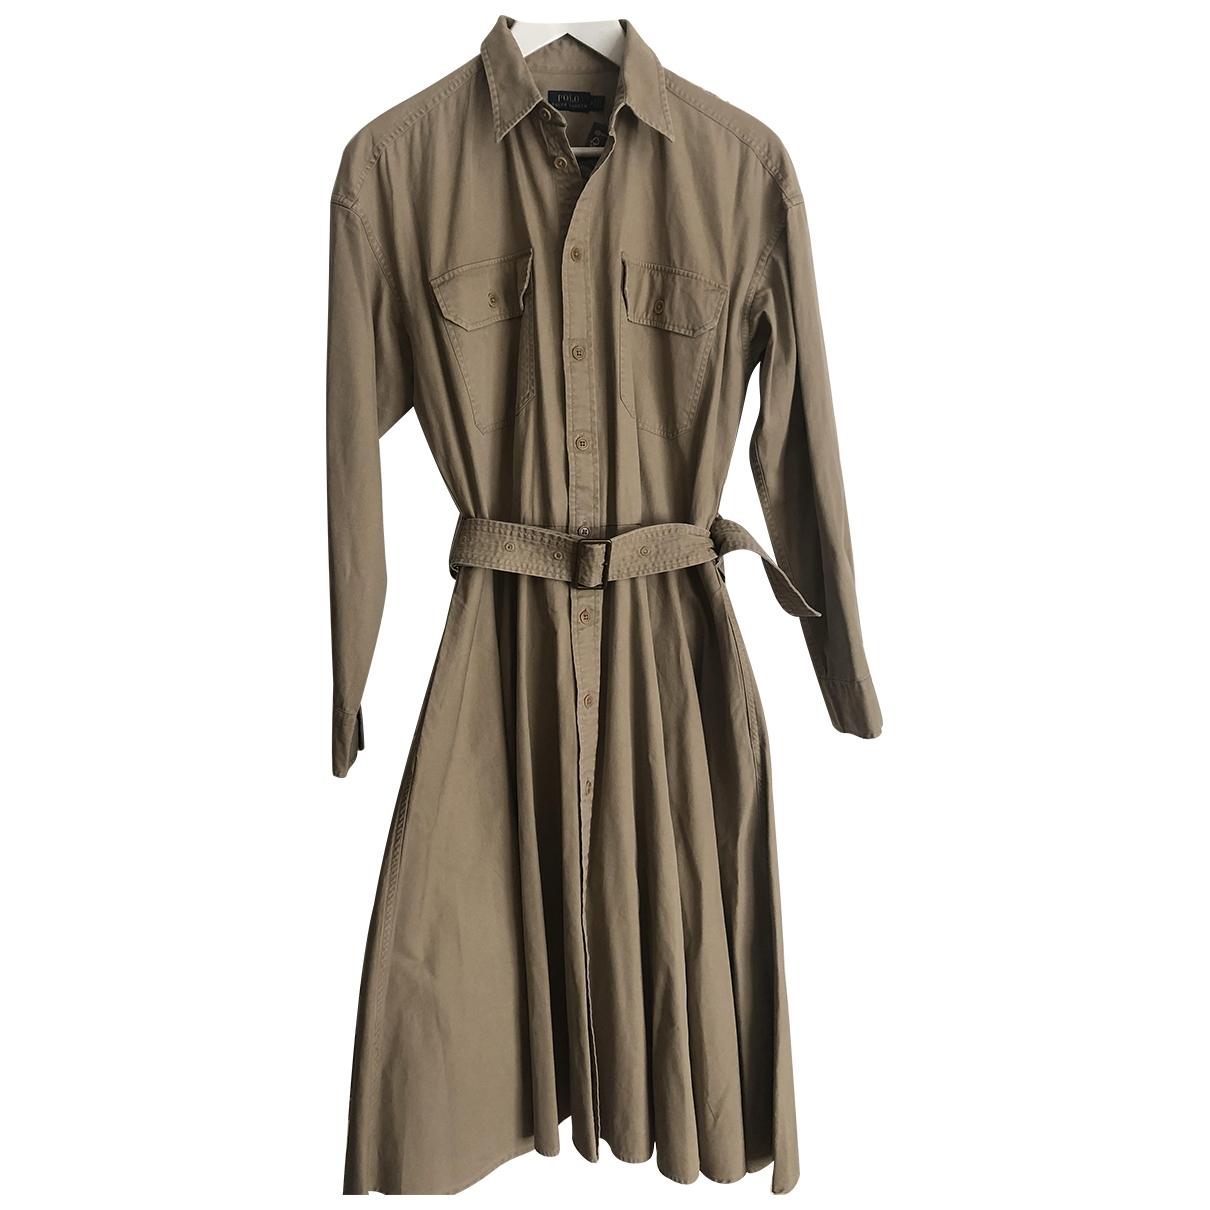 Polo Ralph Lauren \N Kleid in  Beige Baumwolle